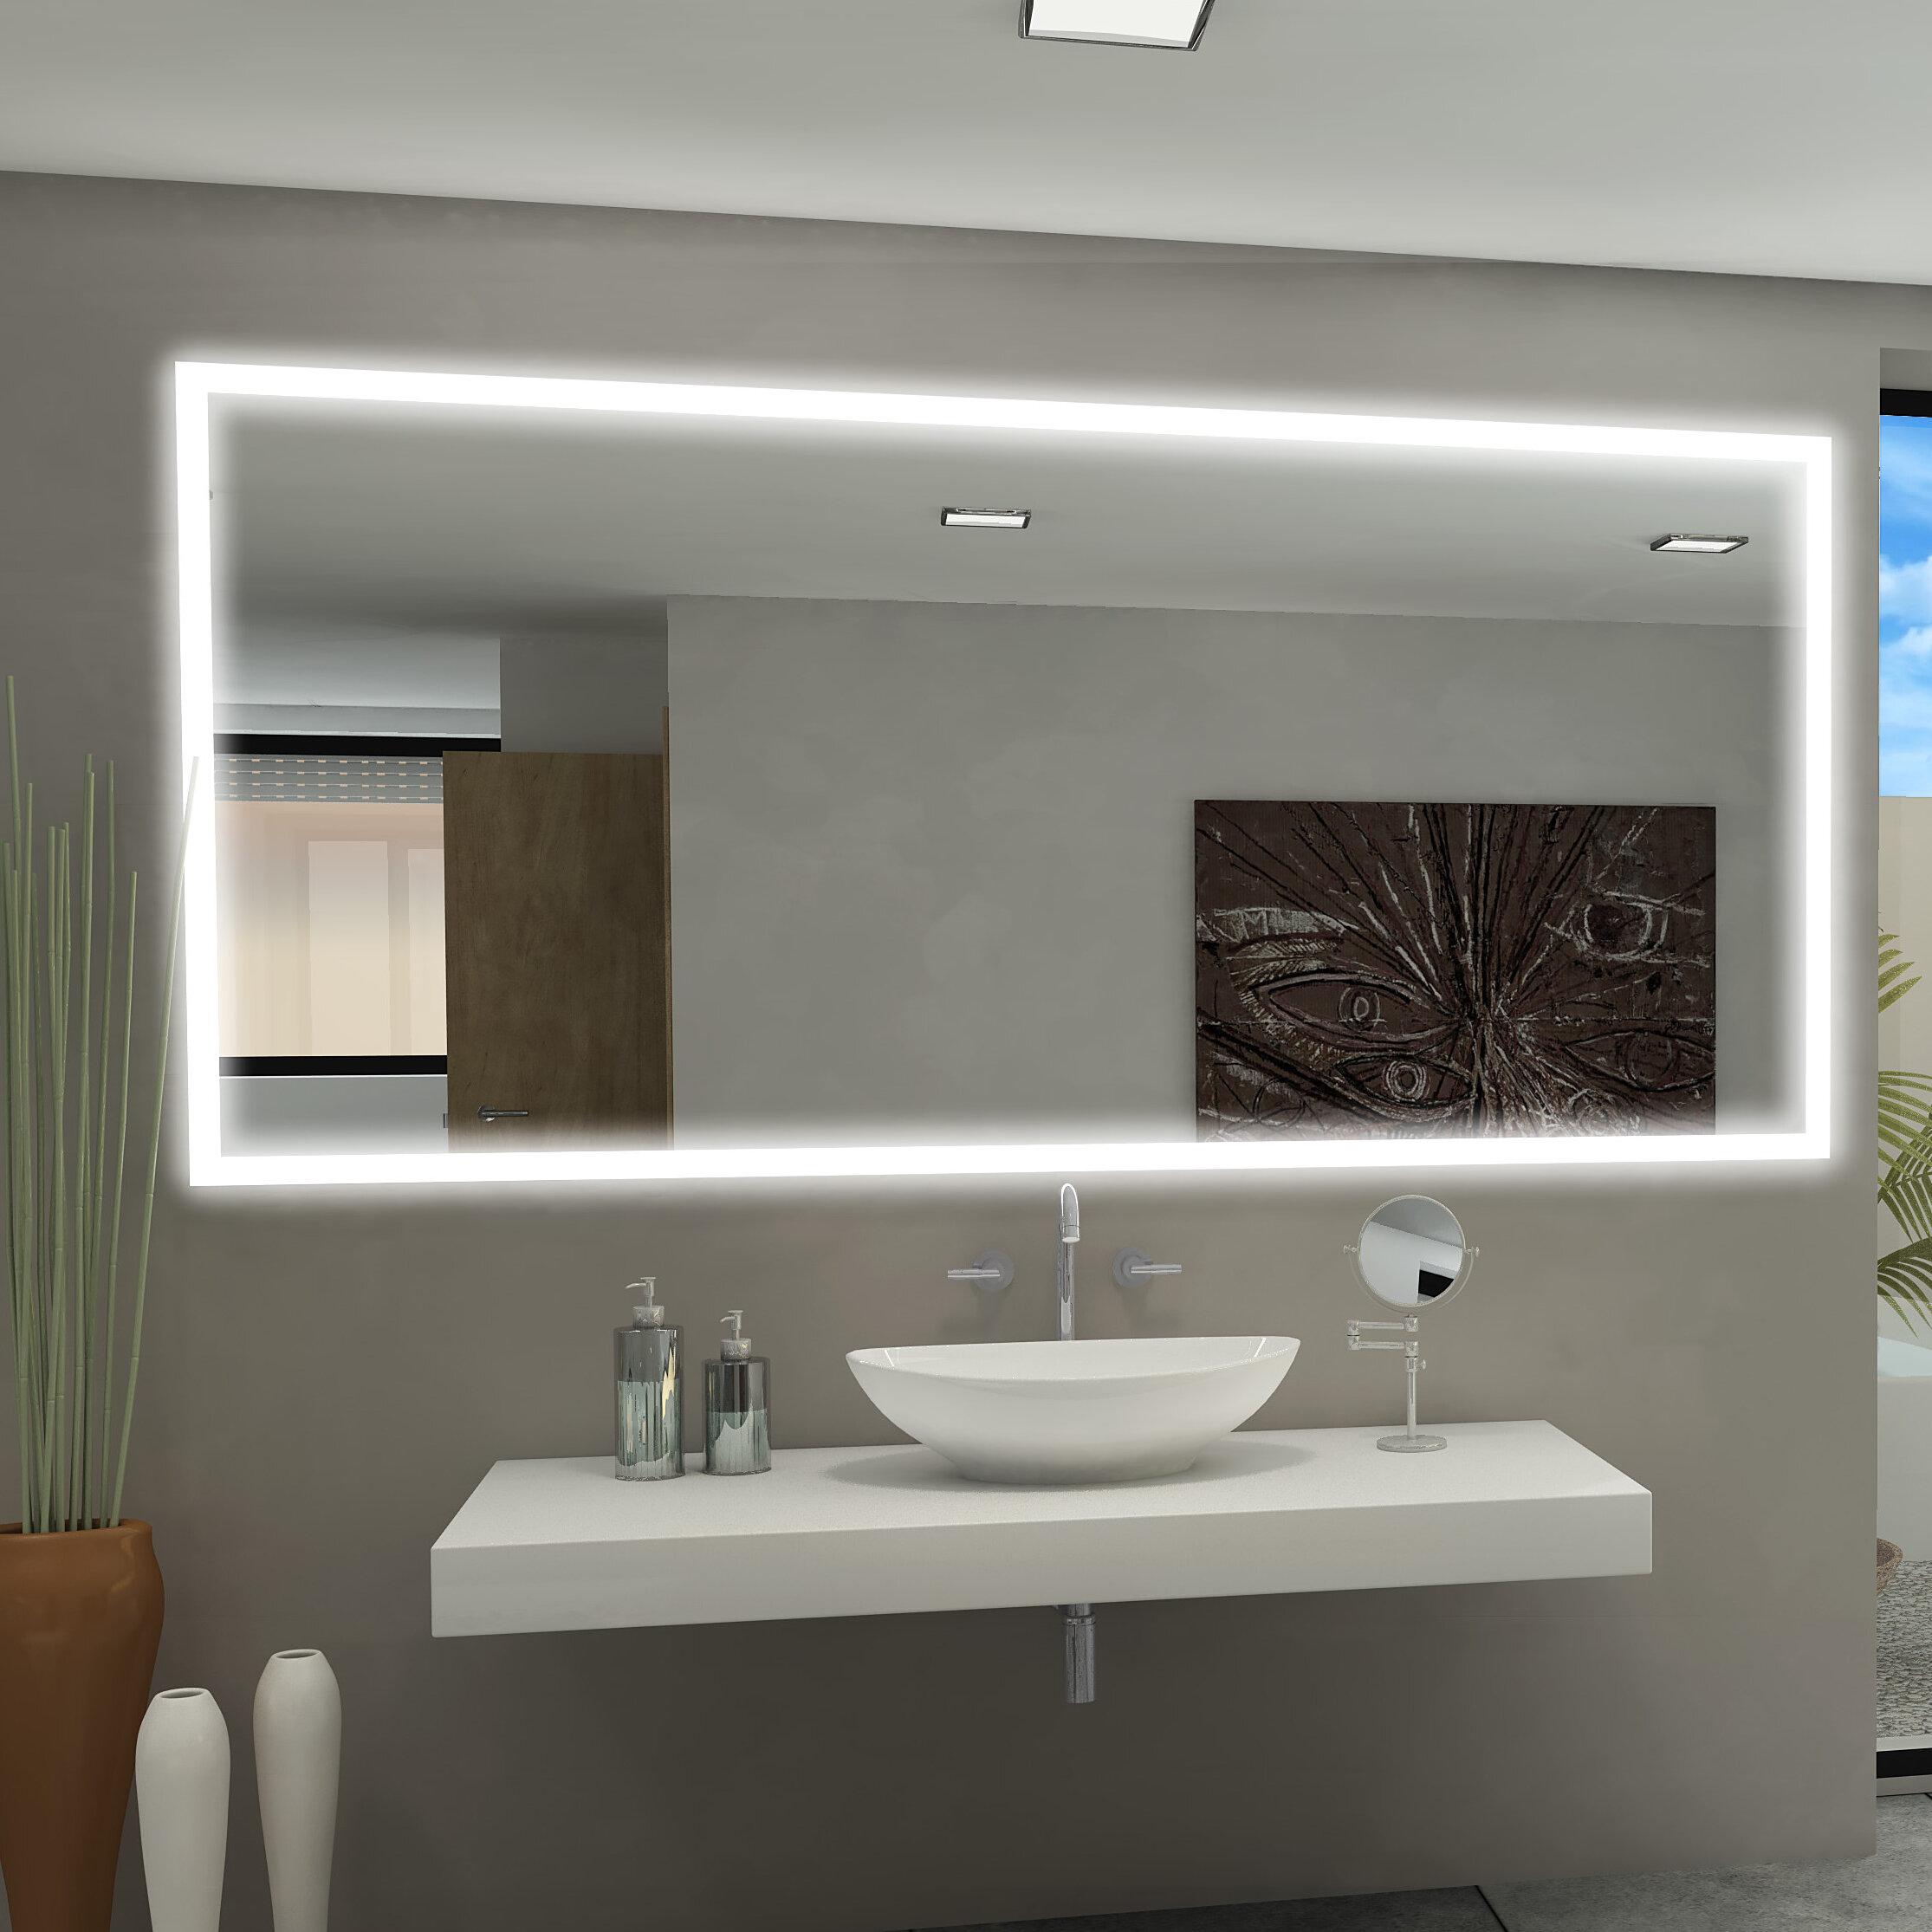 Charmant Paris Mirror Rectangle Backlit Bathroom / Vanity Wall Mirror   Wayfair